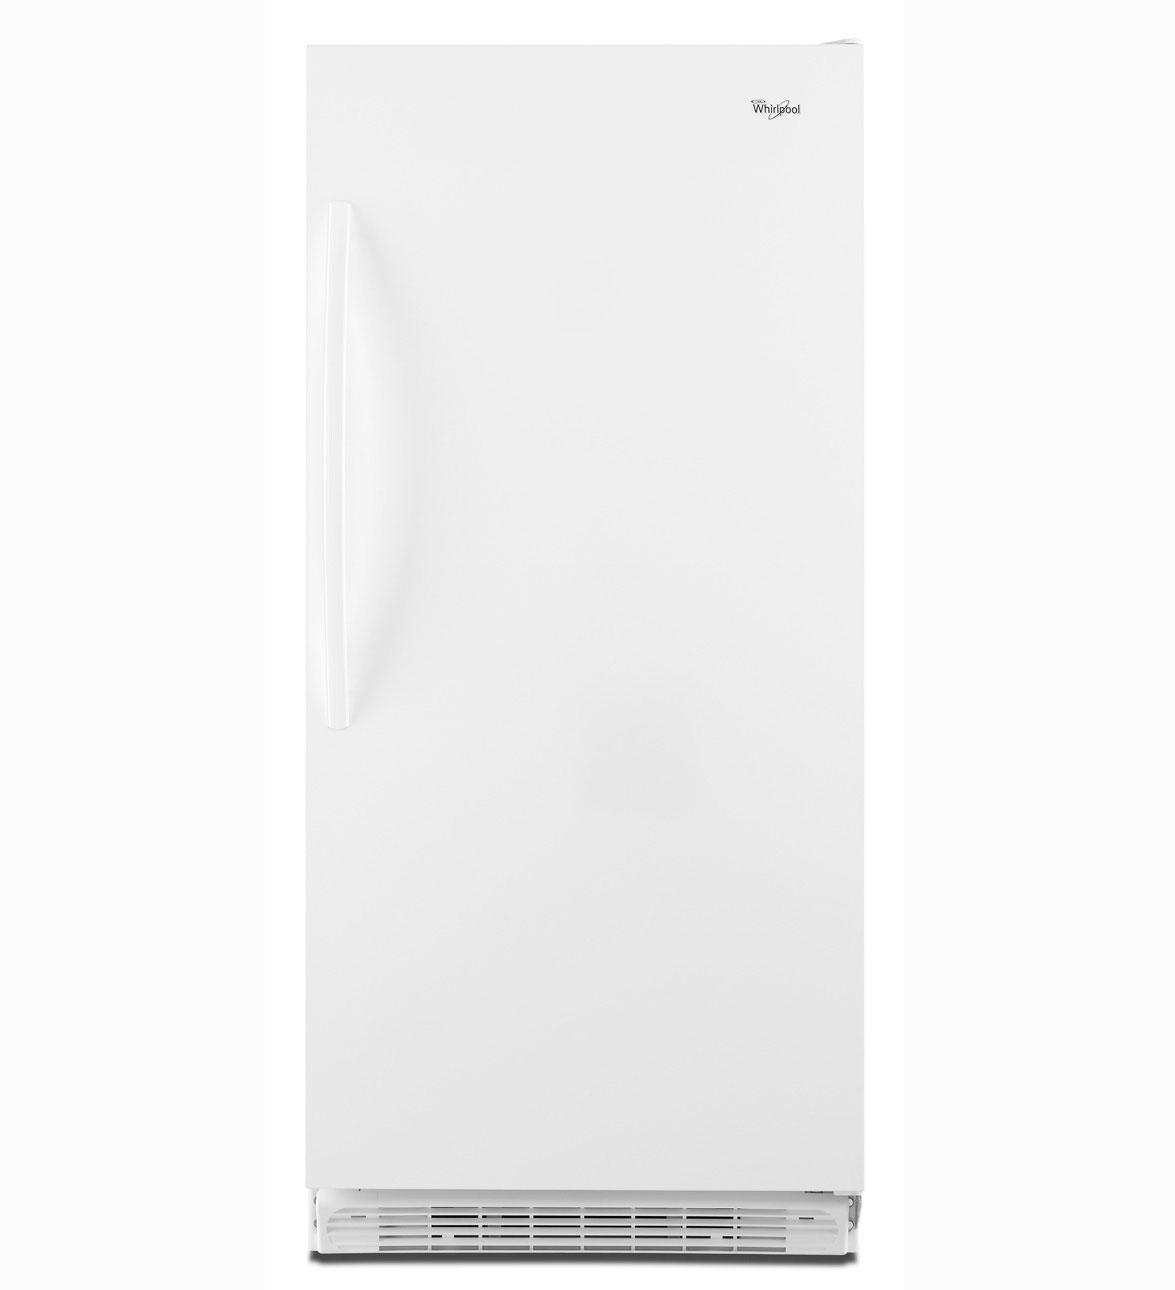 Whirlpool El88trrws 17 7 Cu Ft All Refrigerator With 5